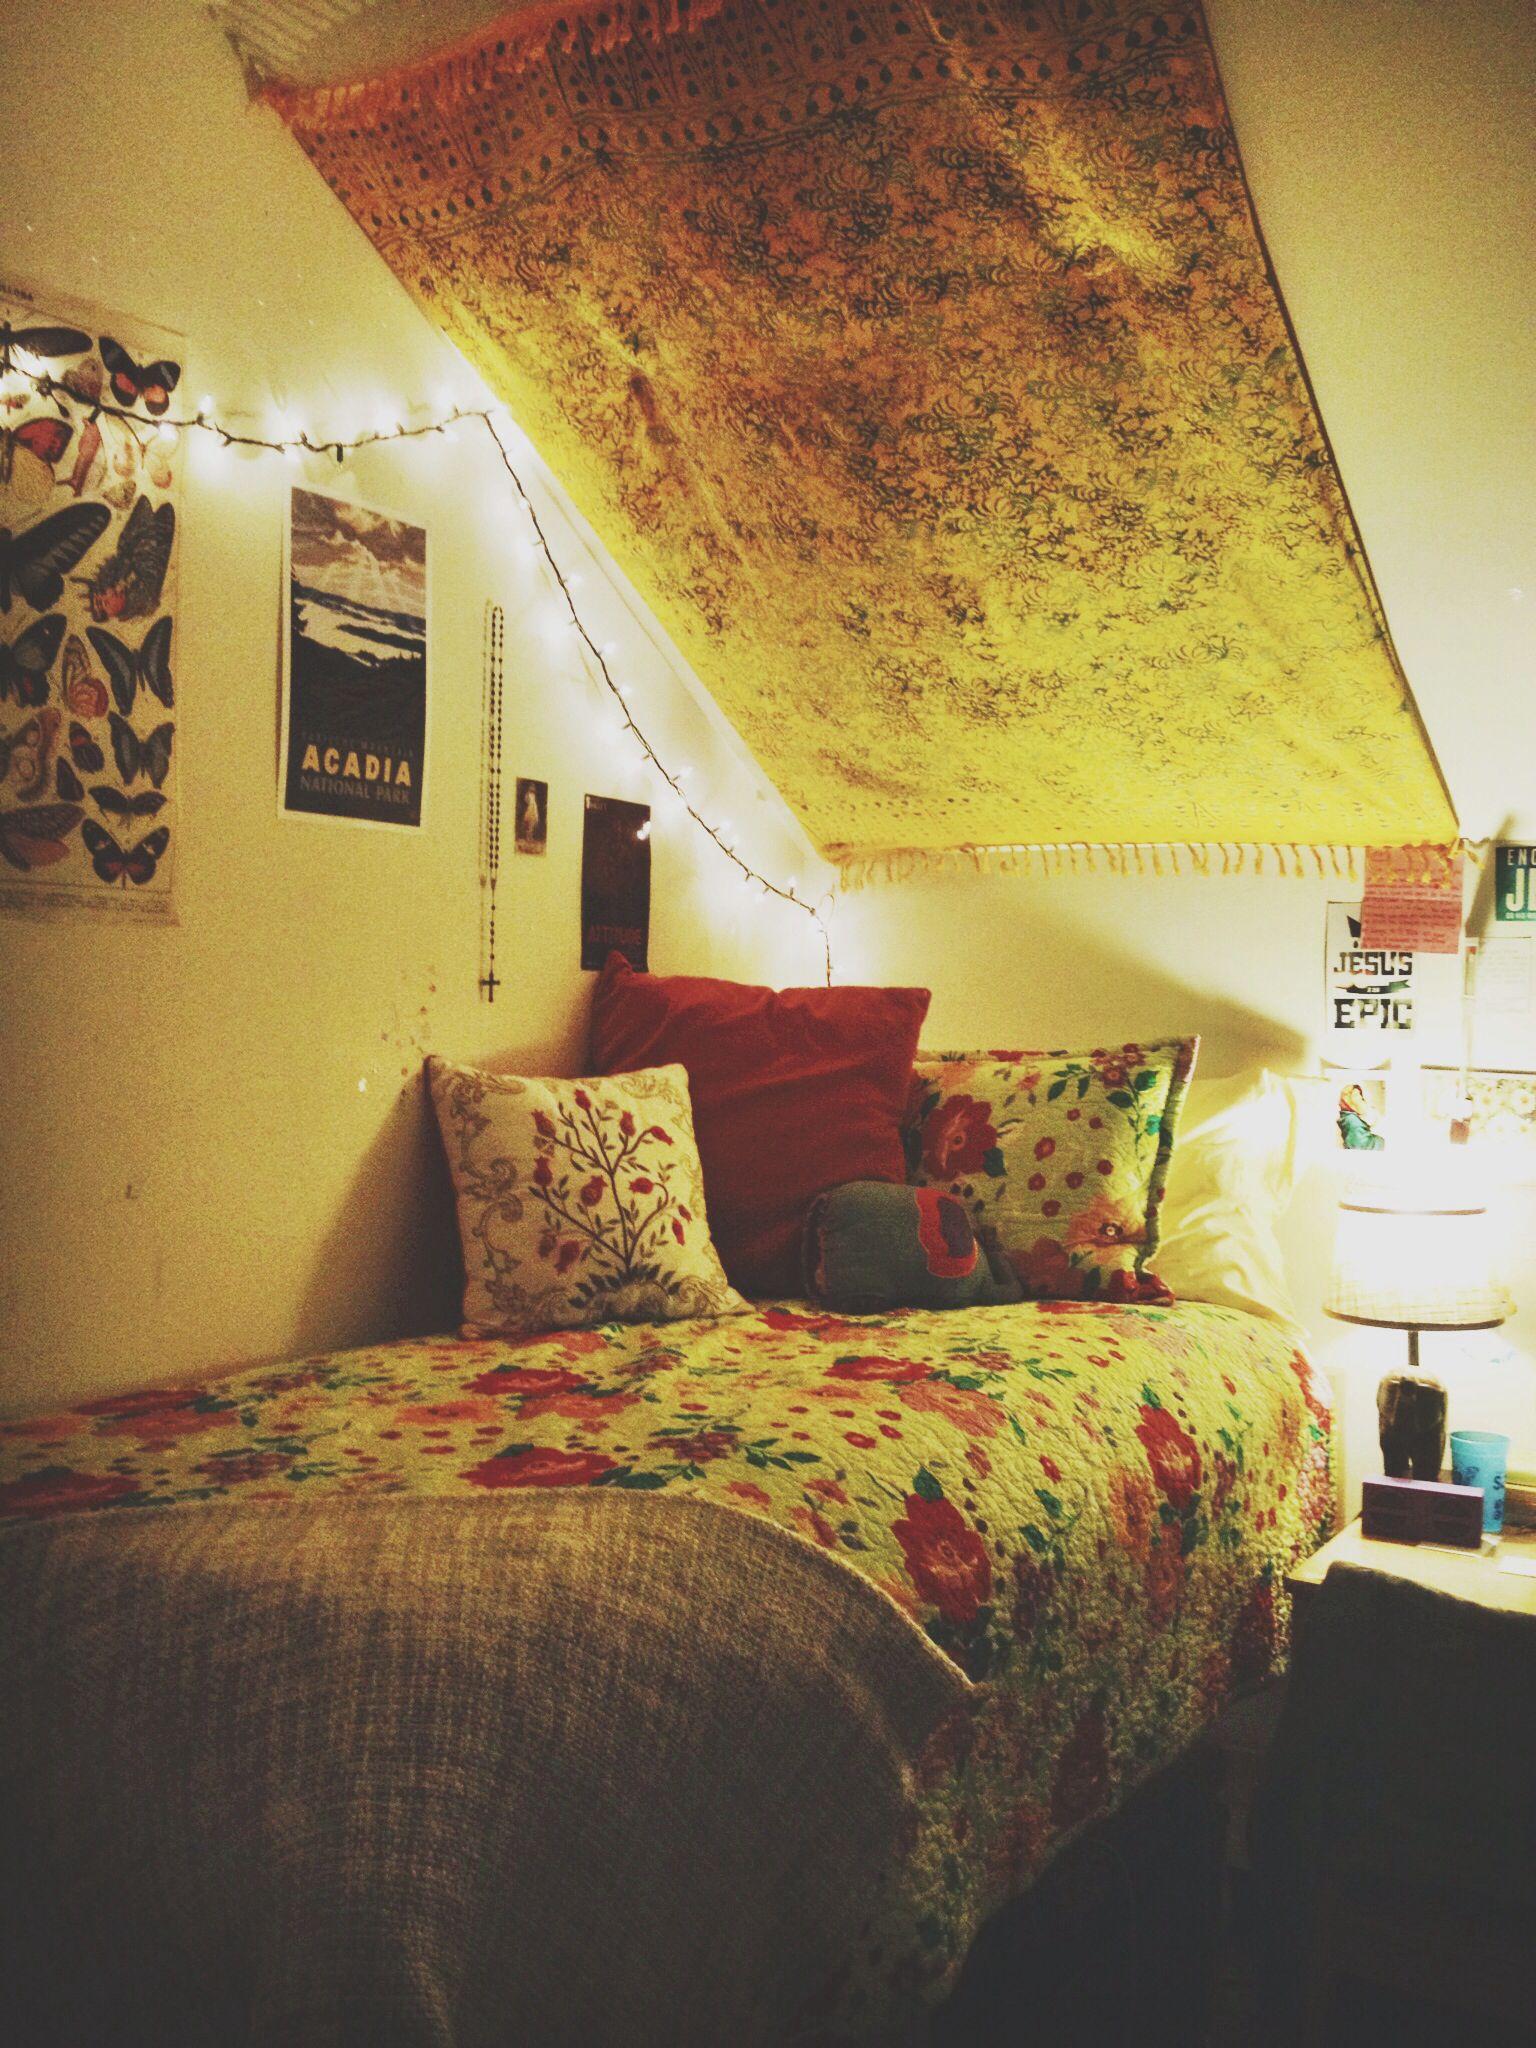 My dorm room, Belmont university in Nashville! | House and dorm ...